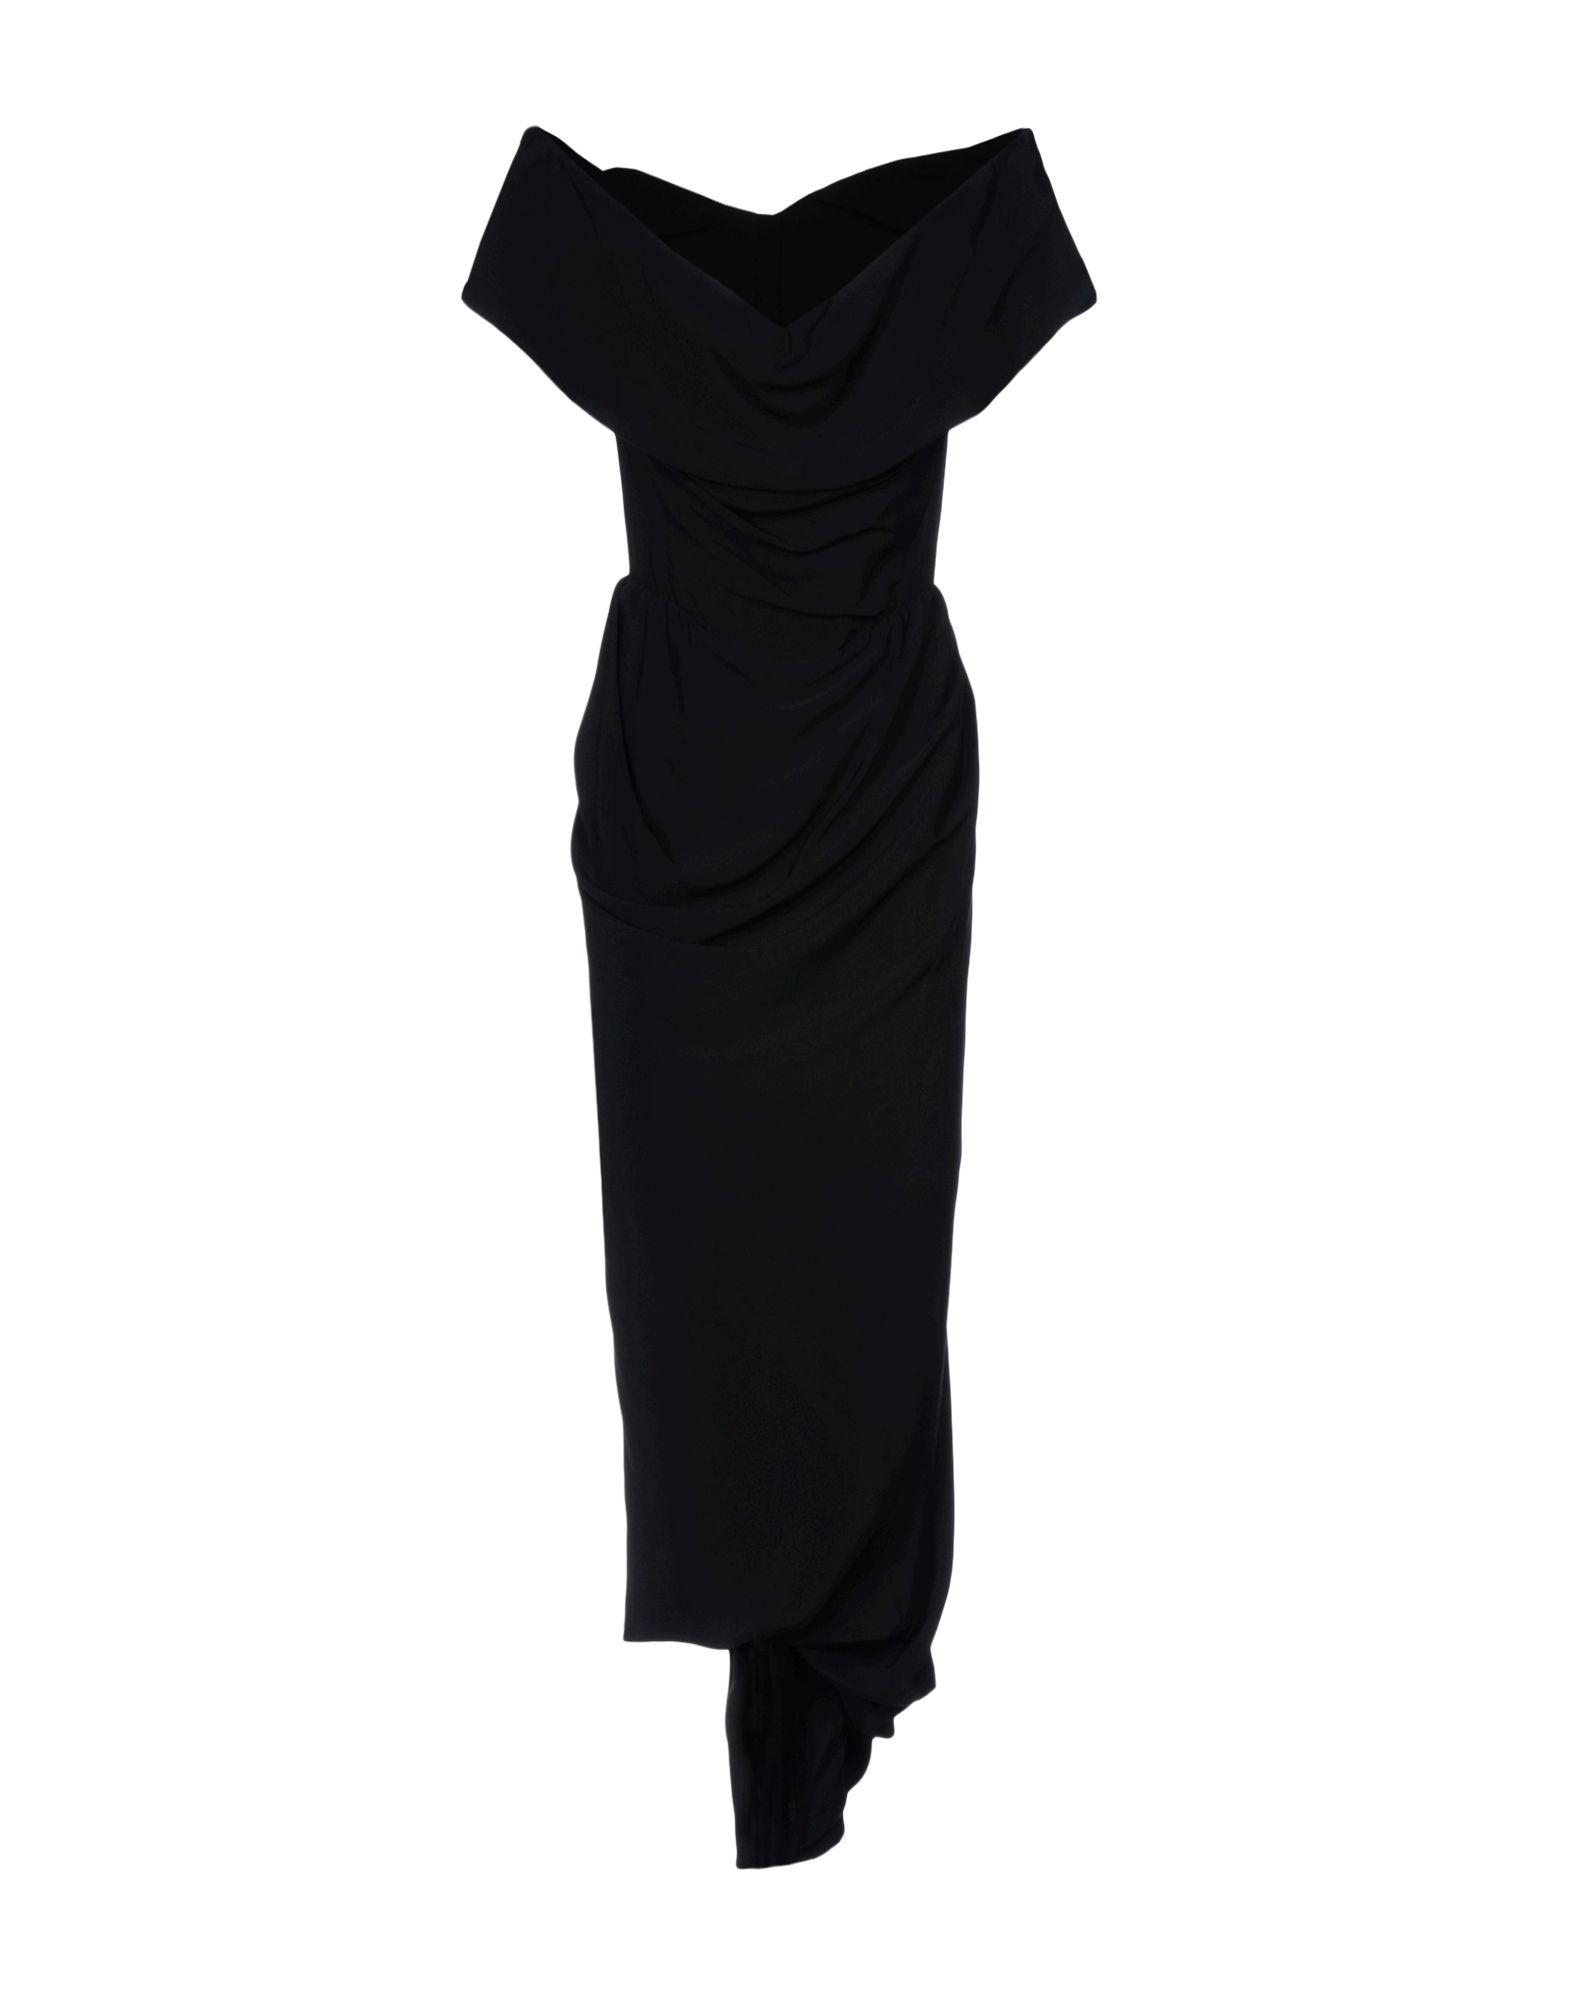 Фото - VIVIENNE WESTWOOD RED LABEL Платье длиной 3/4 vivienne westwood red label длинное платье